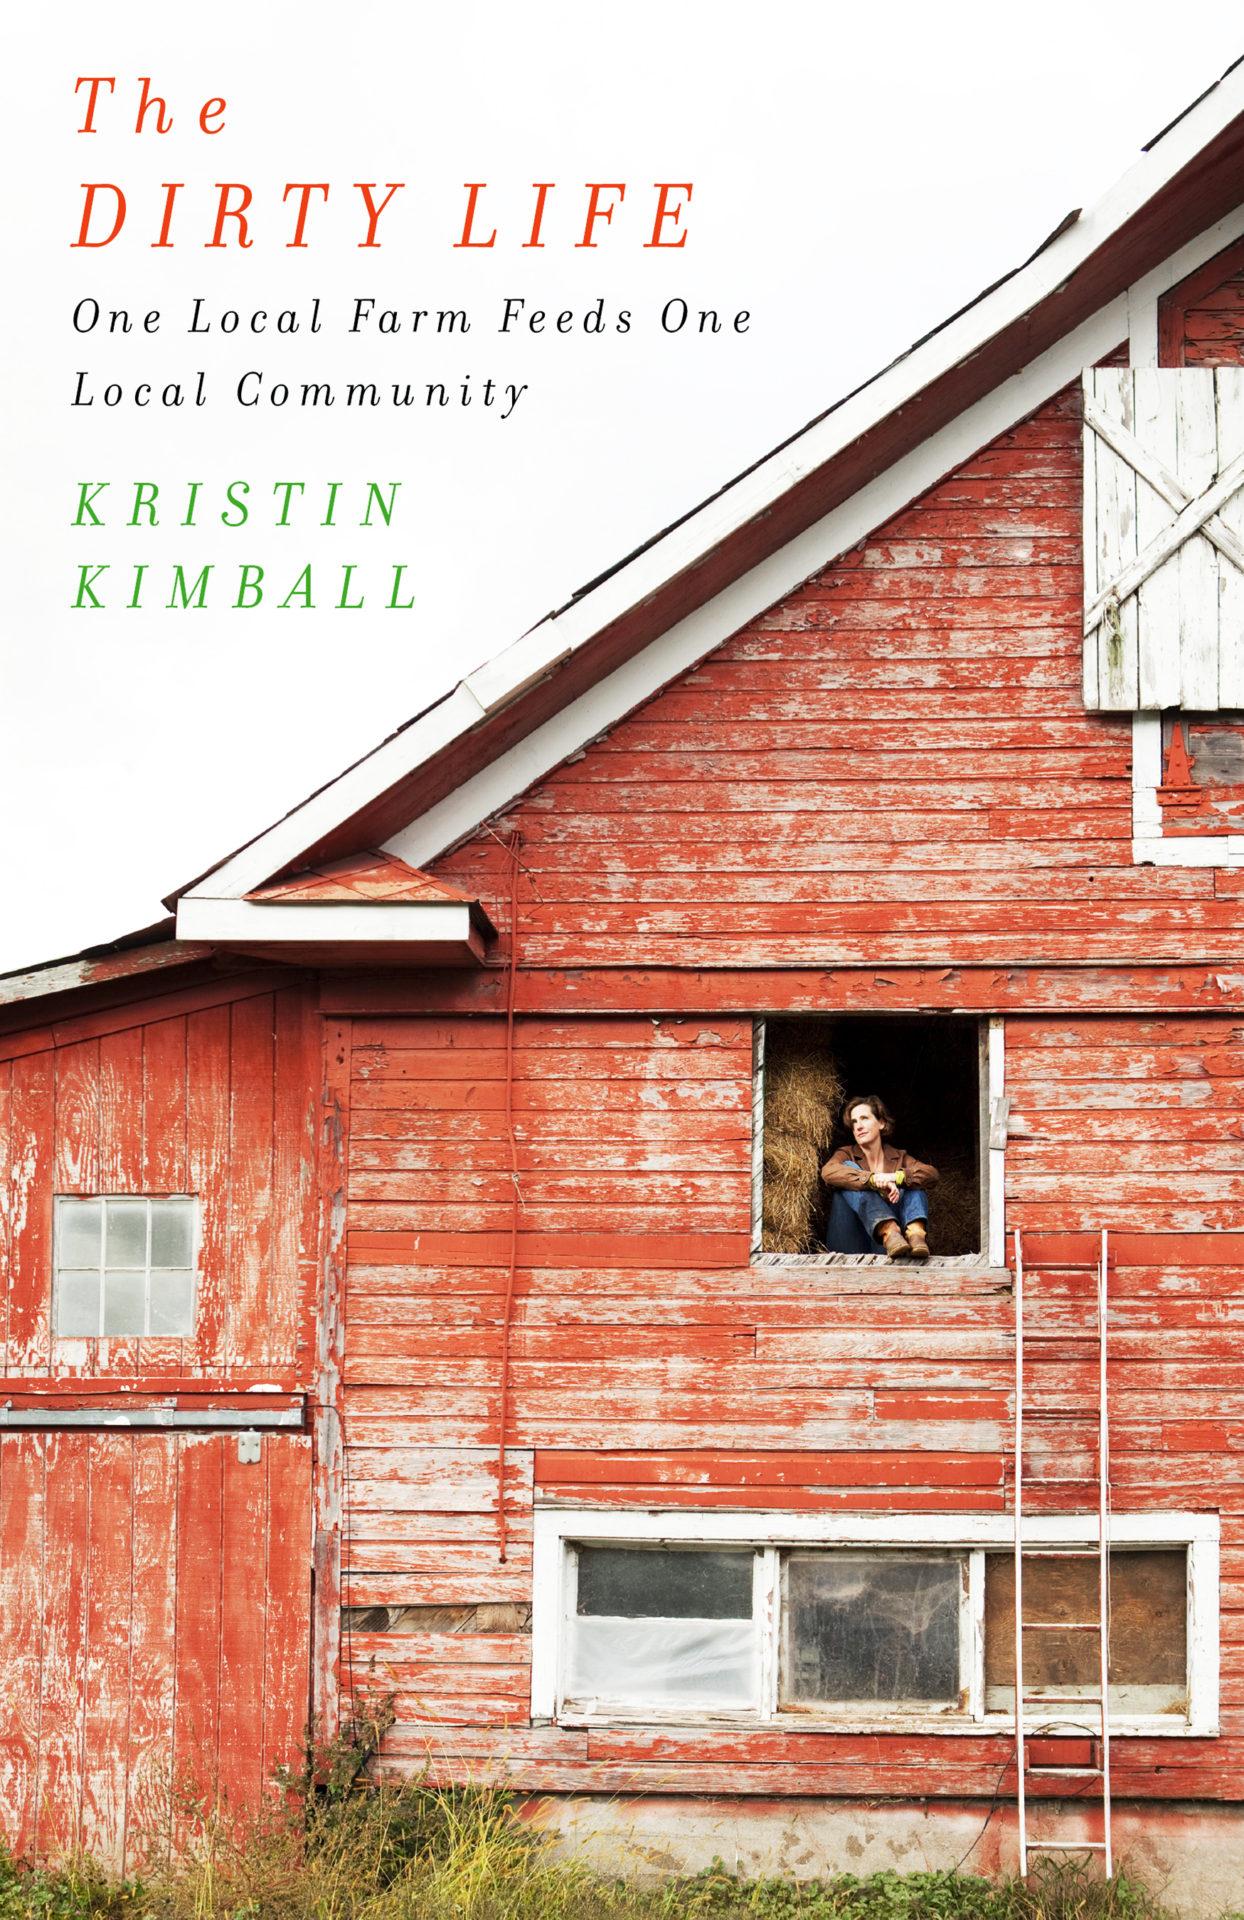 Kristin Kimball